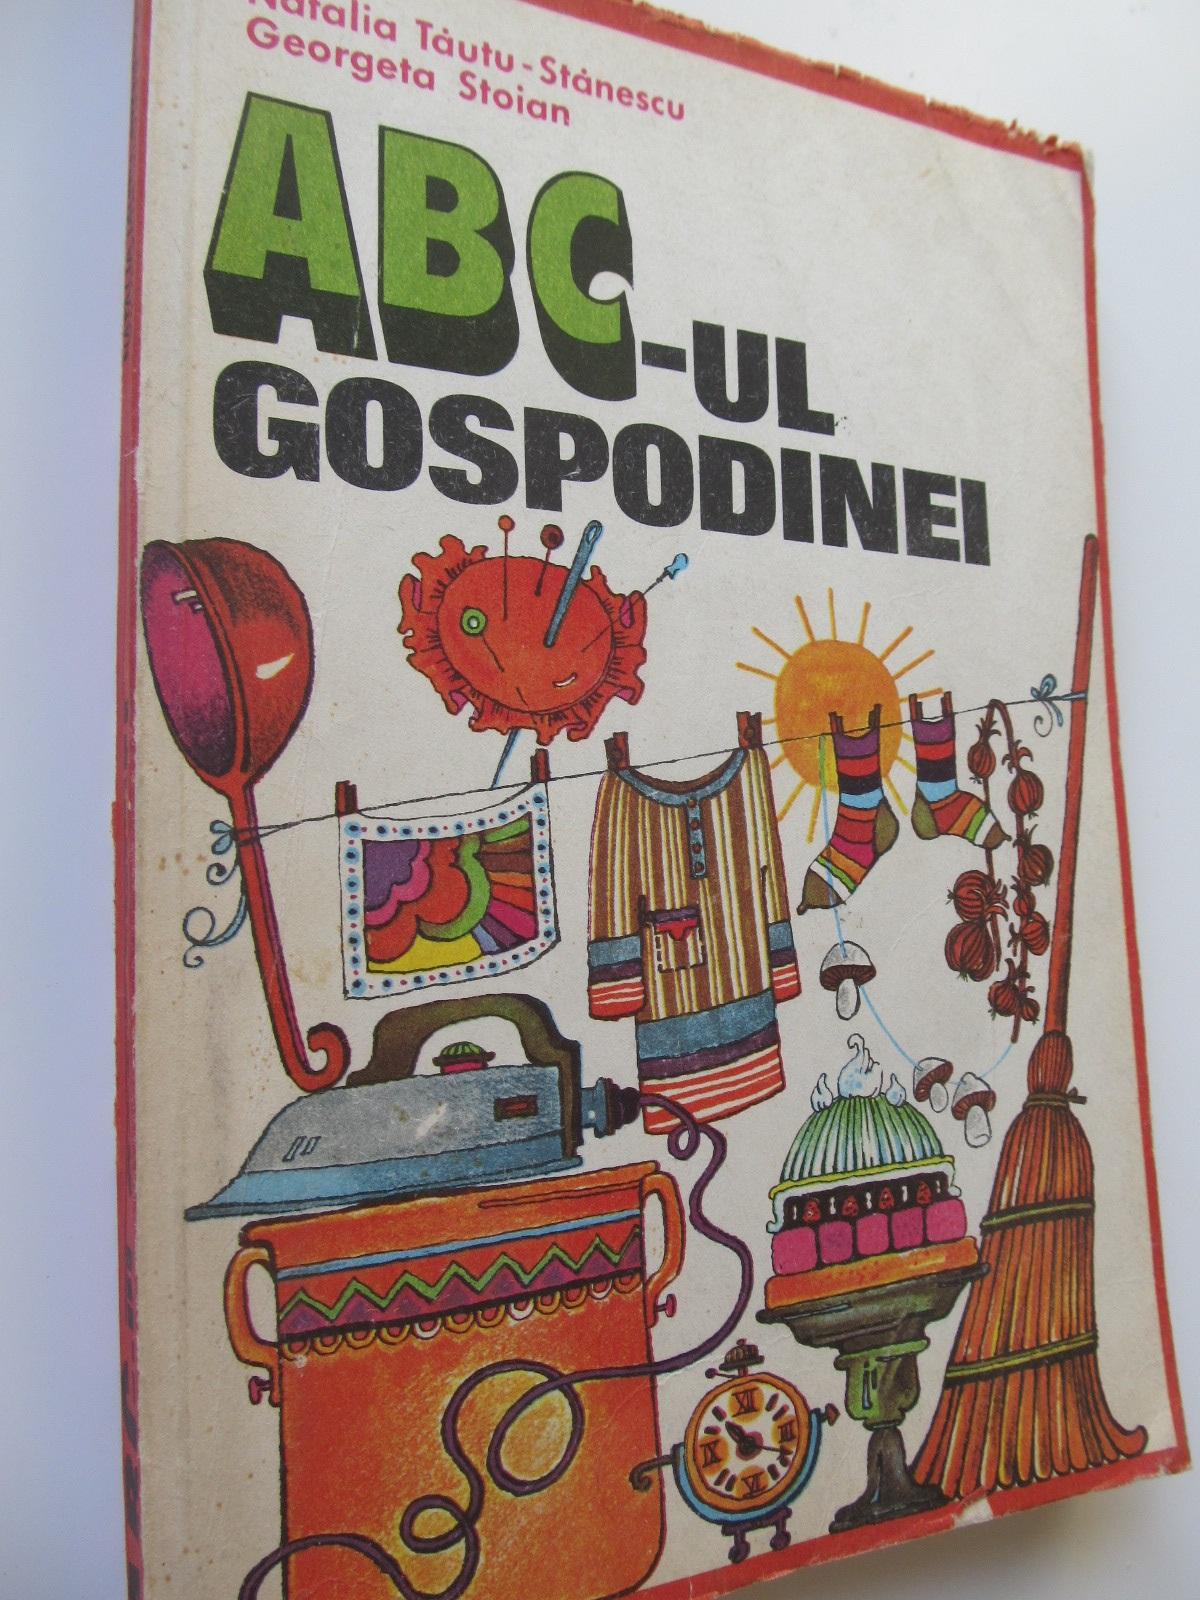 ABC-ul gospodinei - Natalia Tautu Stanescu , Georgeta Stoian | Detalii carte